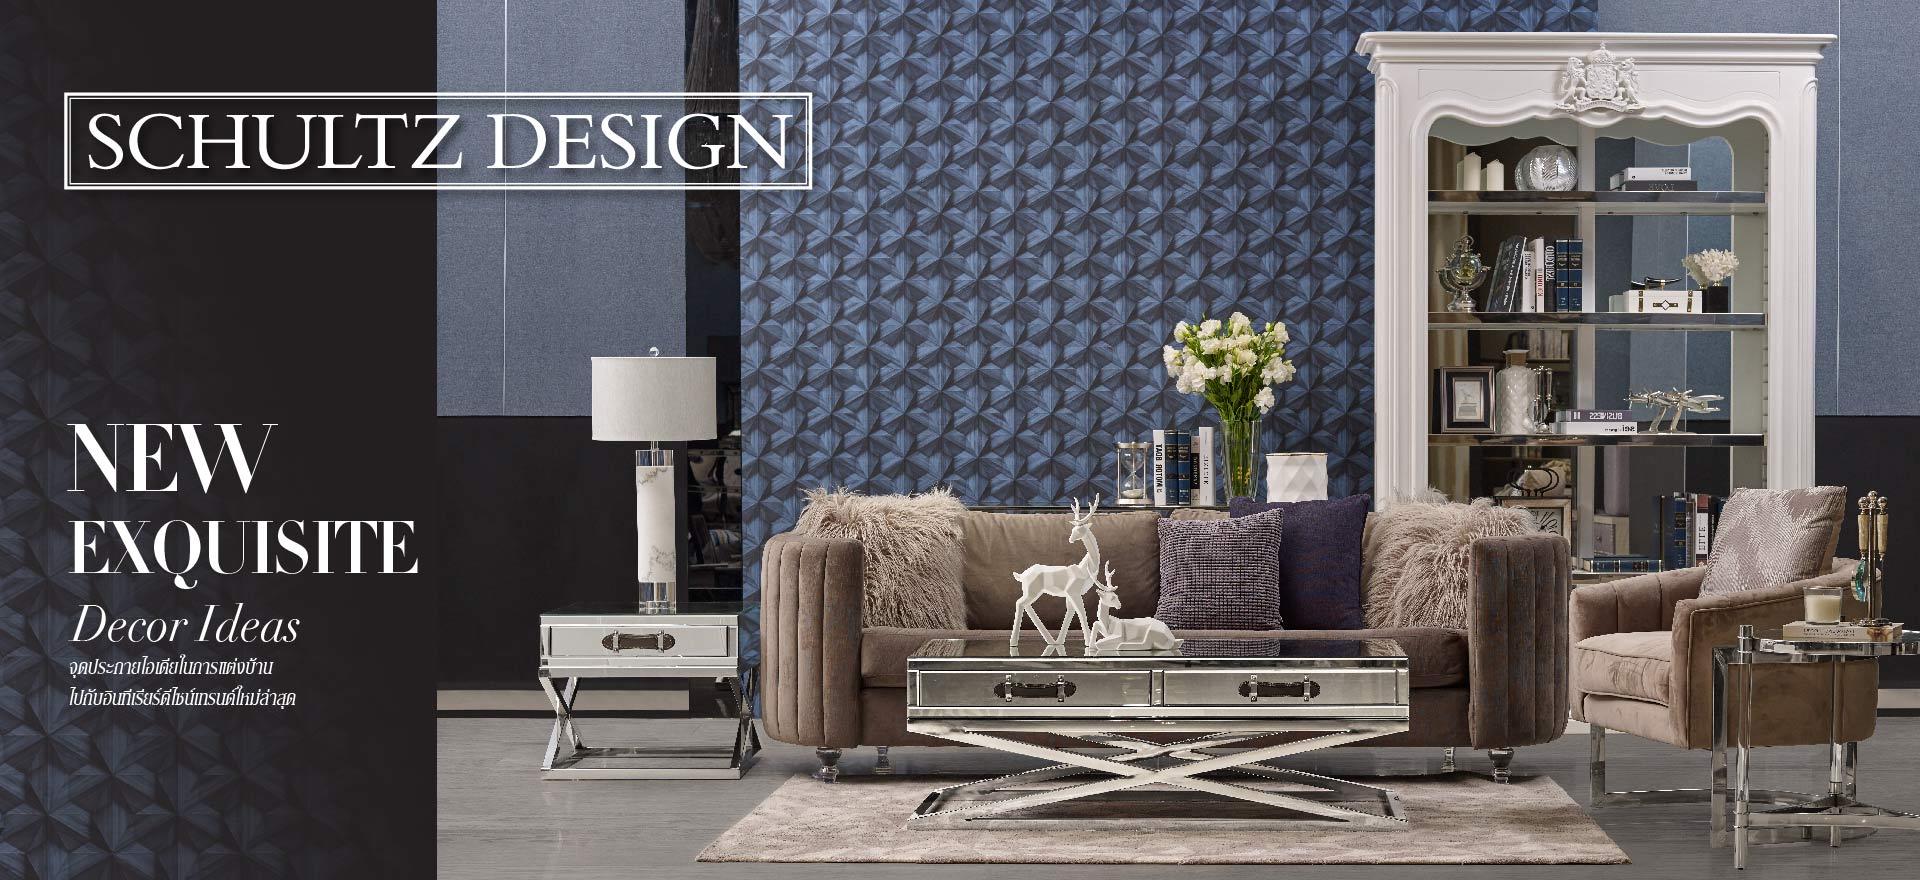 Schultz Design Catalog 2018